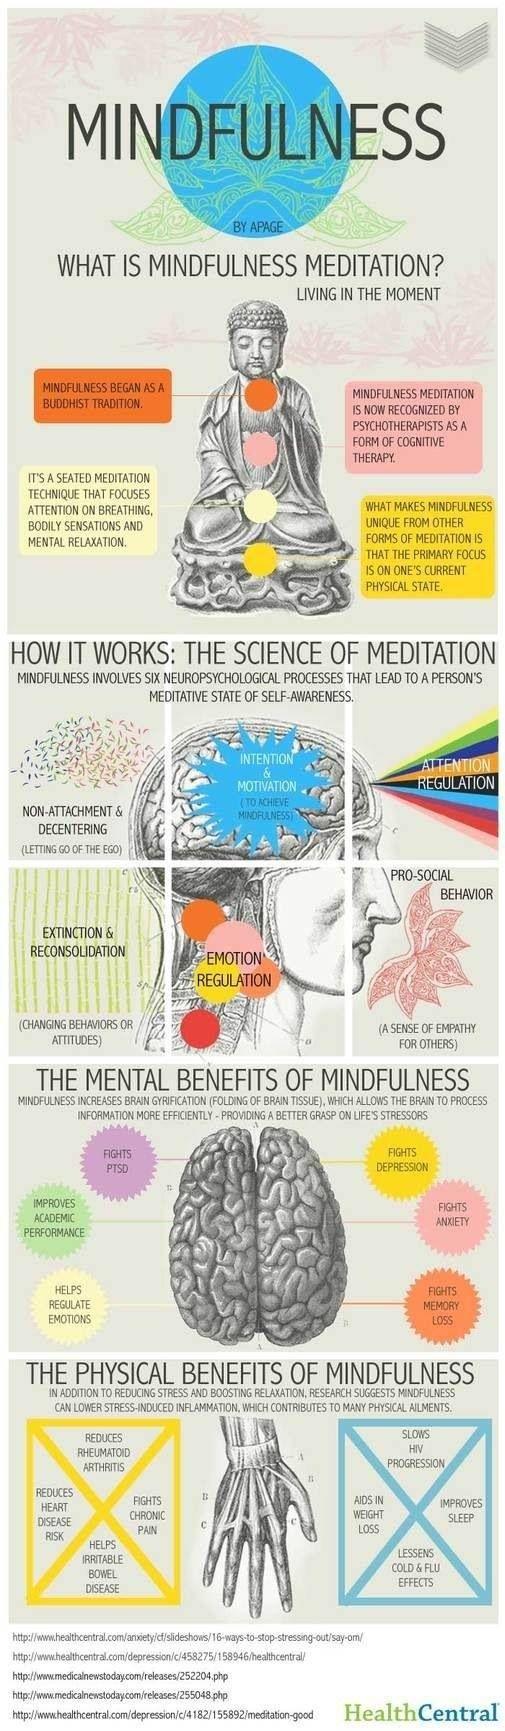 Meditation https://bestproductsfor.com/life-style